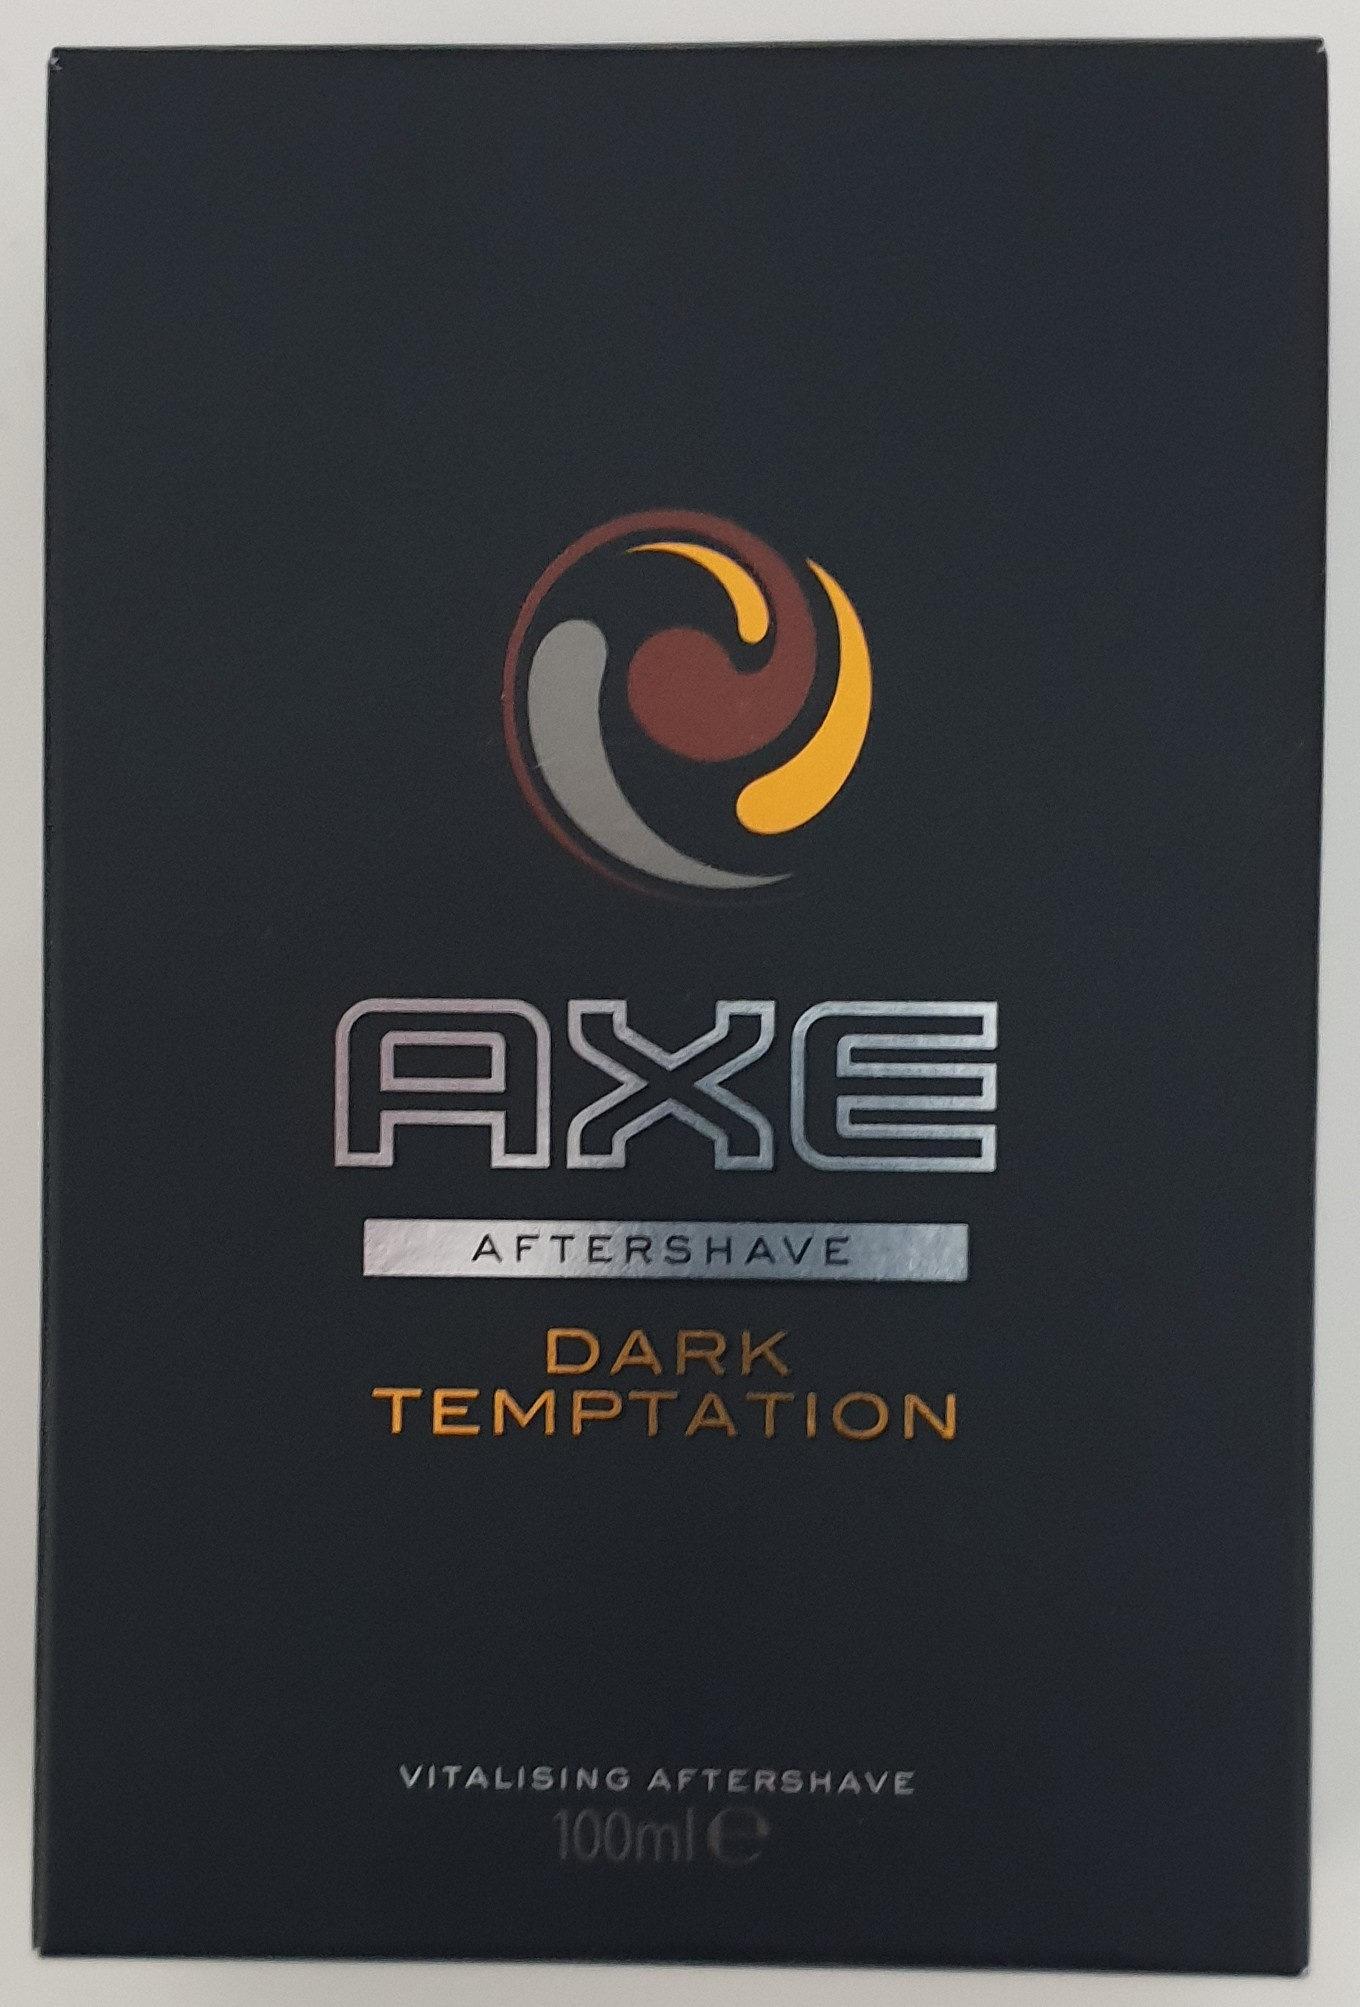 Axe aftershave dark temptation - Product - de